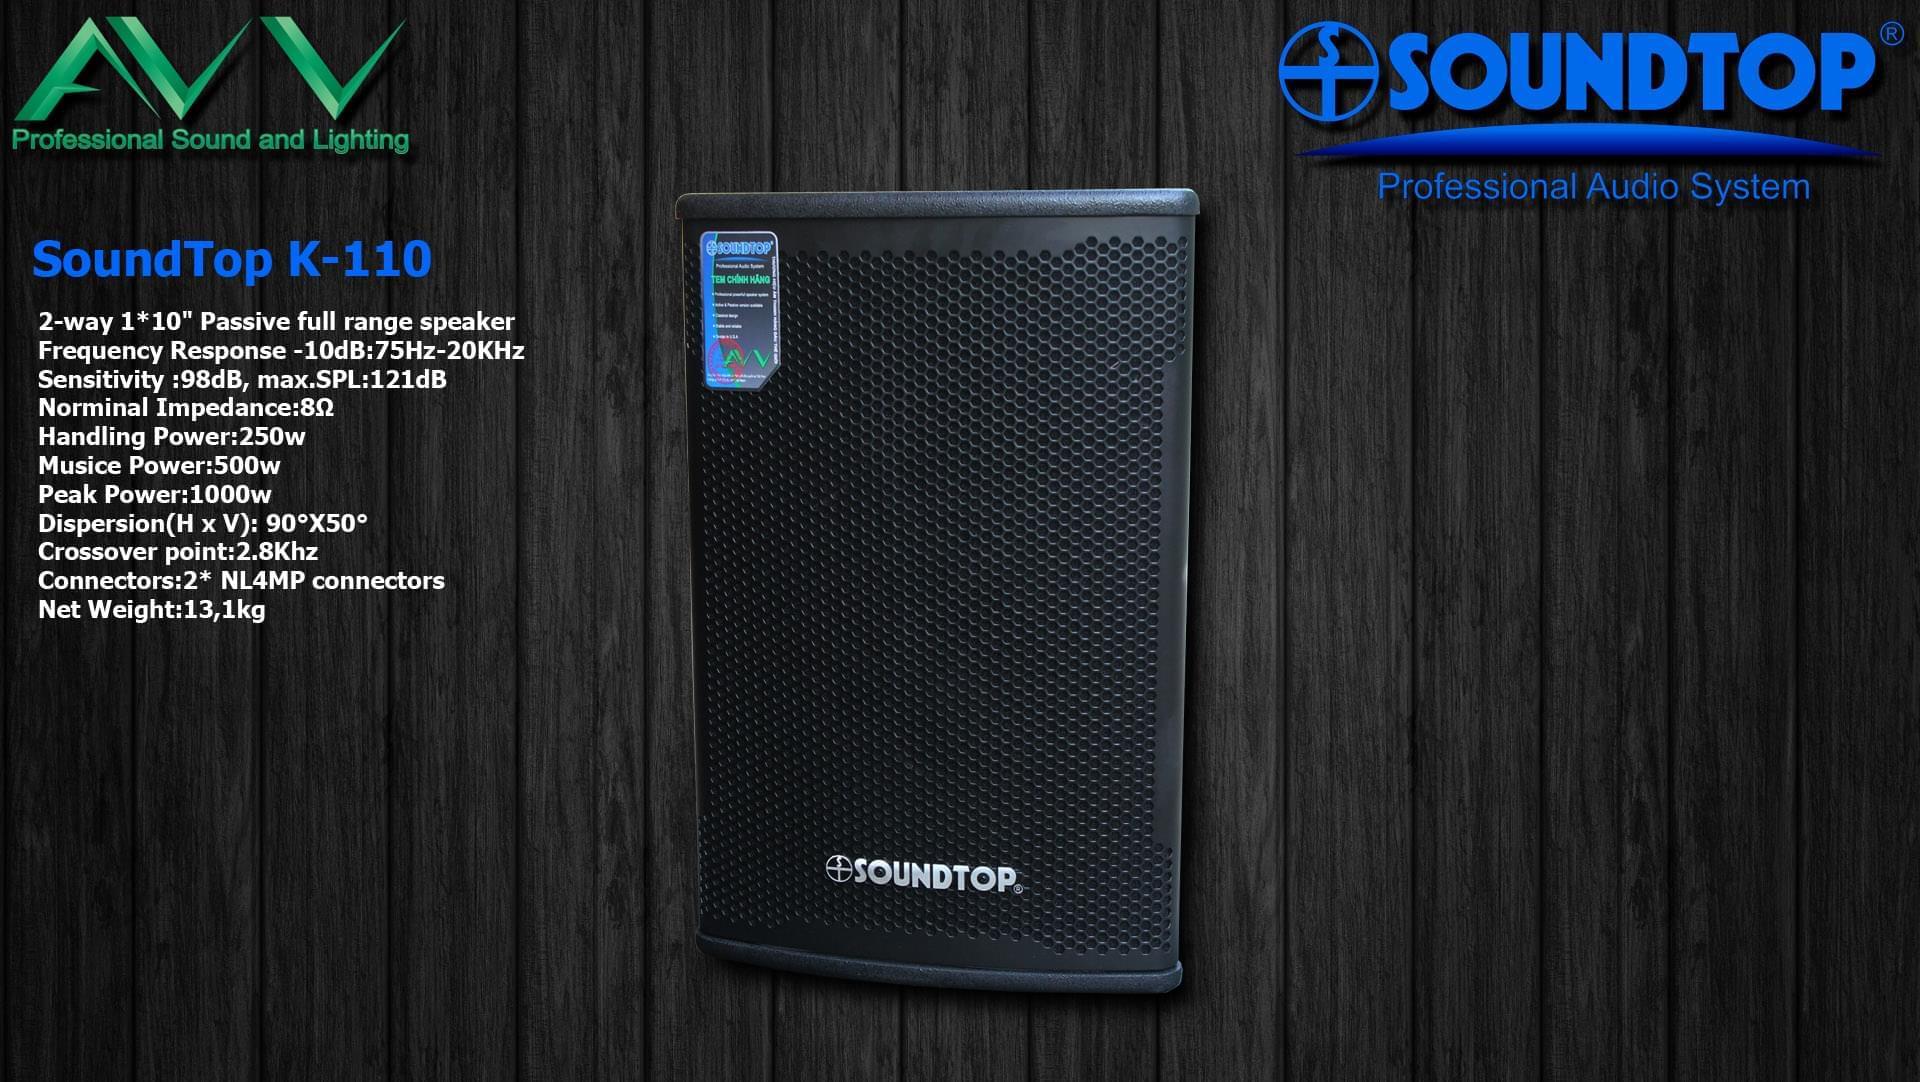 soundtop-k-110-chi-tiet.jpg